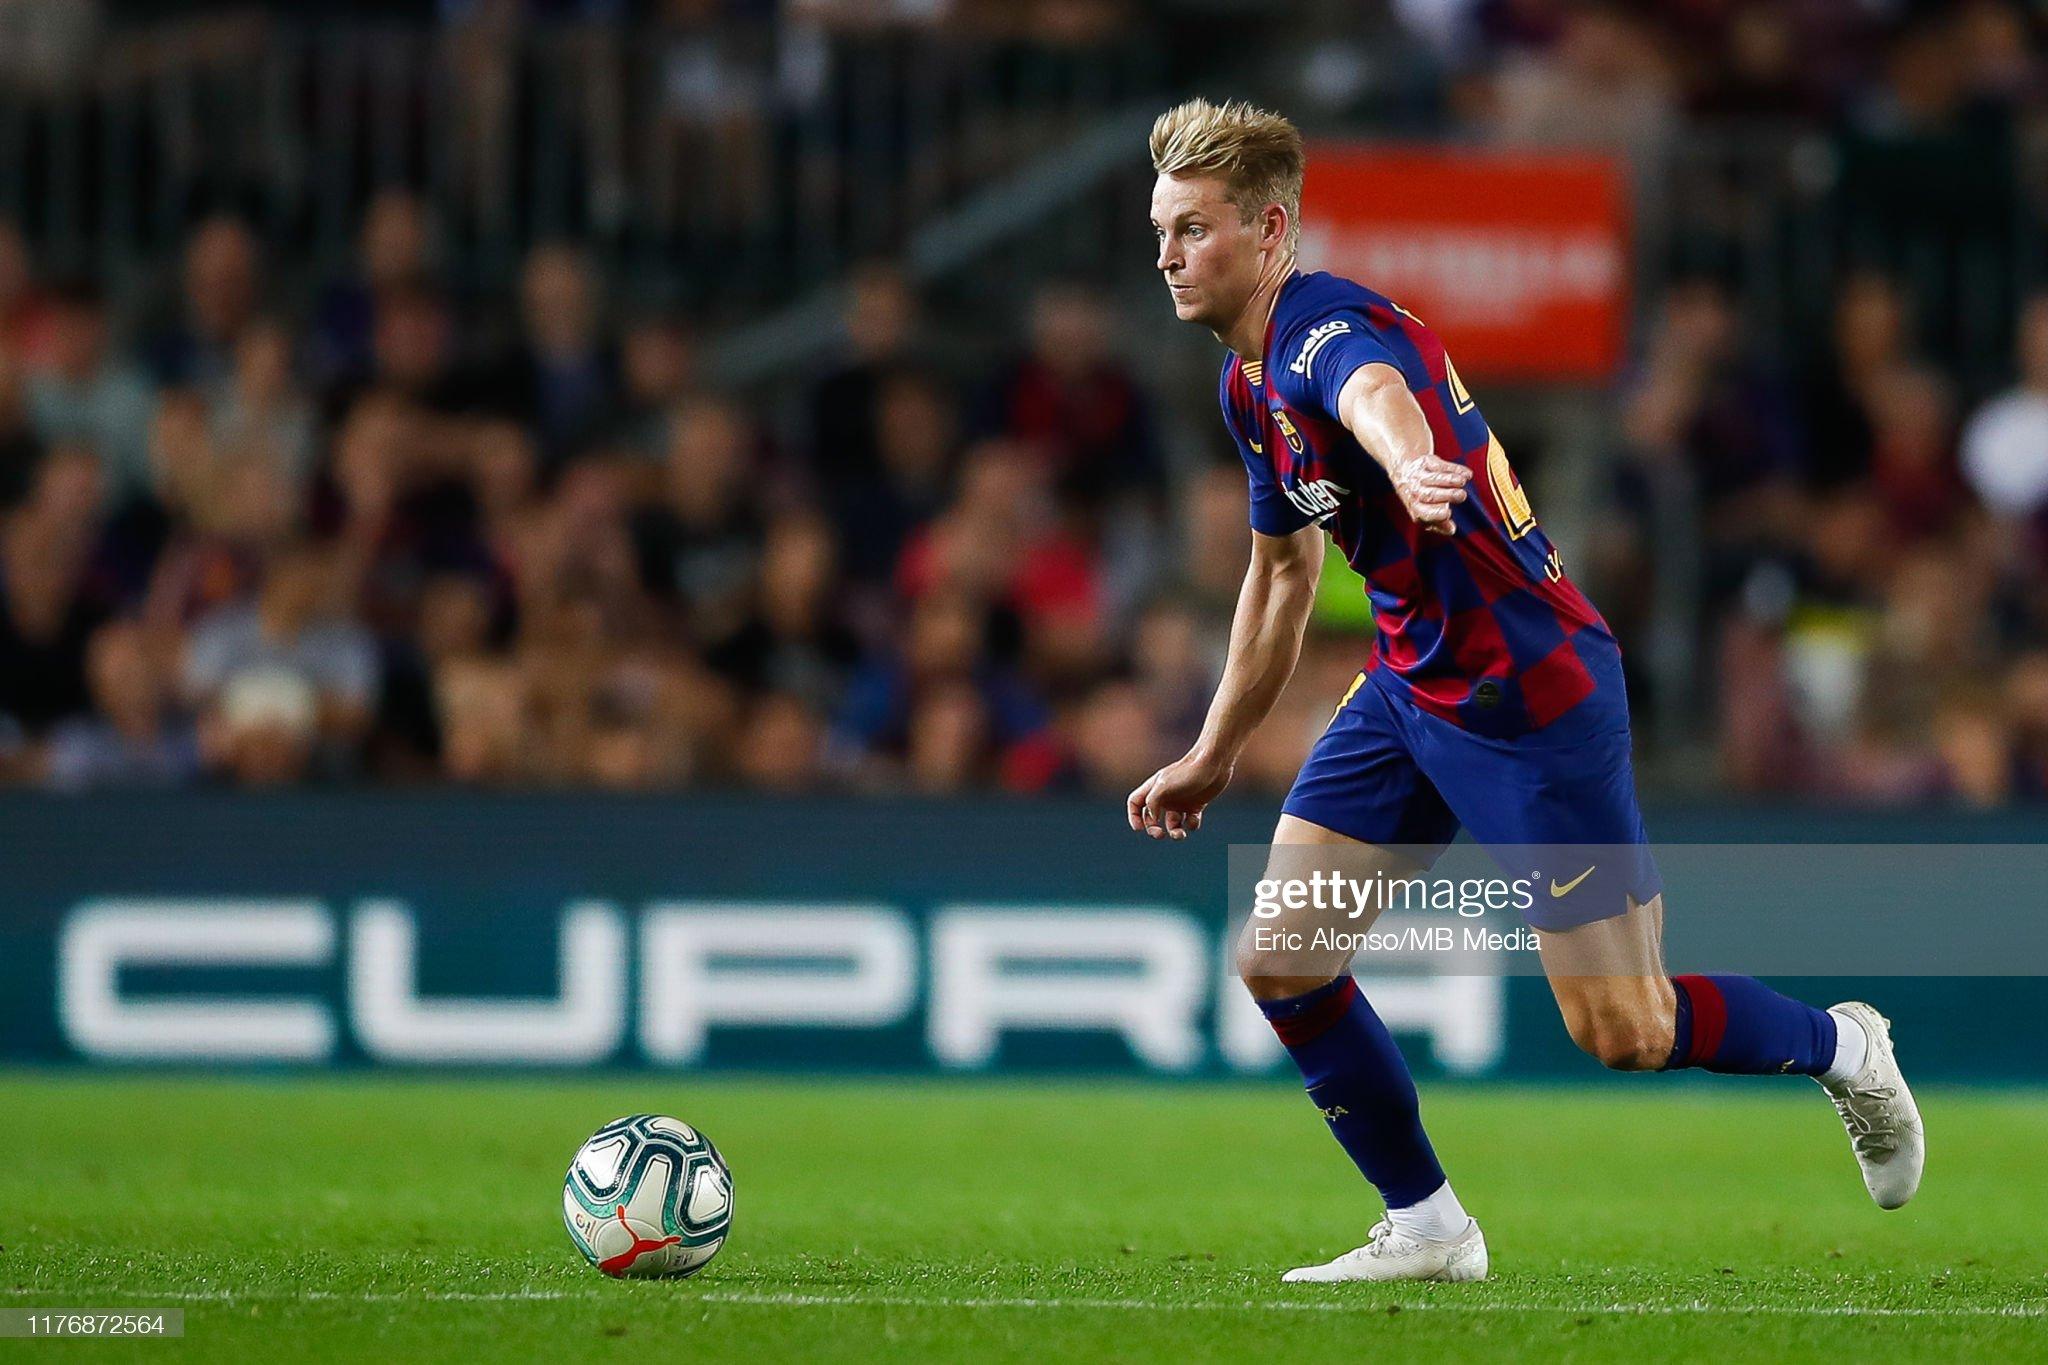 صور مباراة : برشلونة - فياريال 2-1 ( 24-09-2019 )  Frenkie-de-jong-of-fc-barcelona-passes-the-ball-during-the-liga-match-picture-id1176872564?s=2048x2048